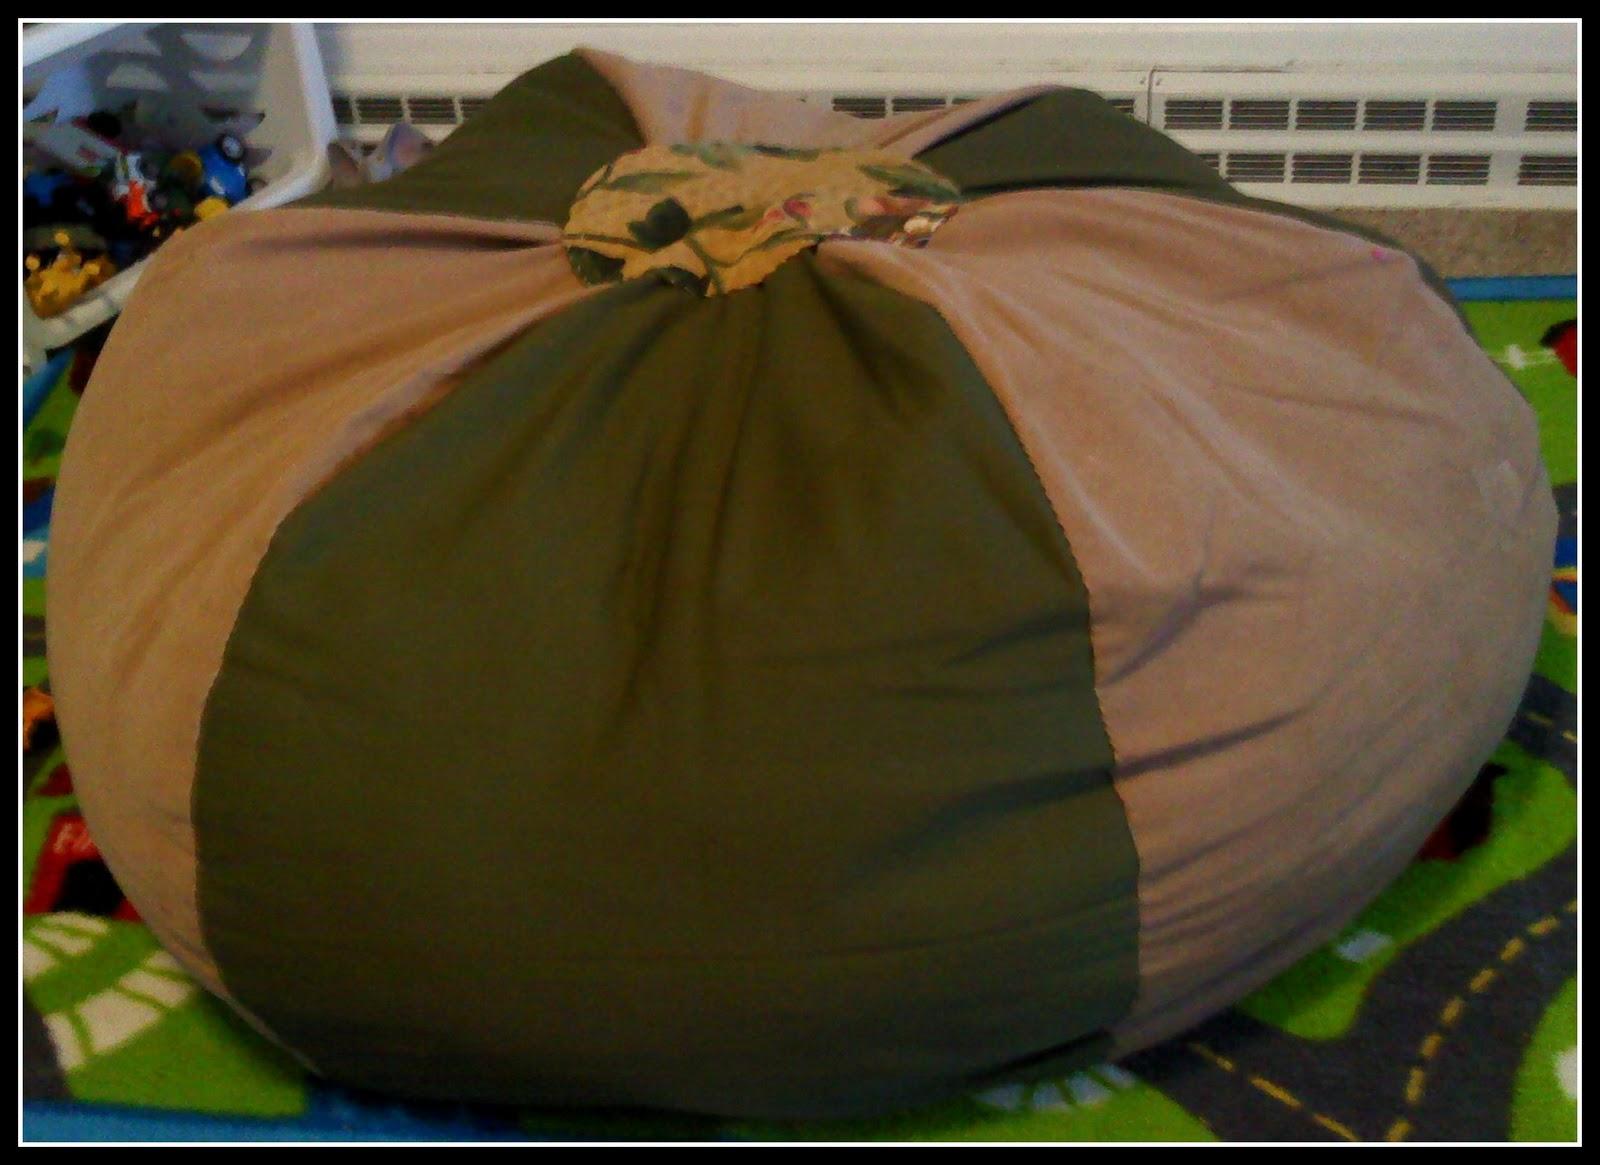 The Walnut Acre Chronicles Homemade Bean Bag Chair